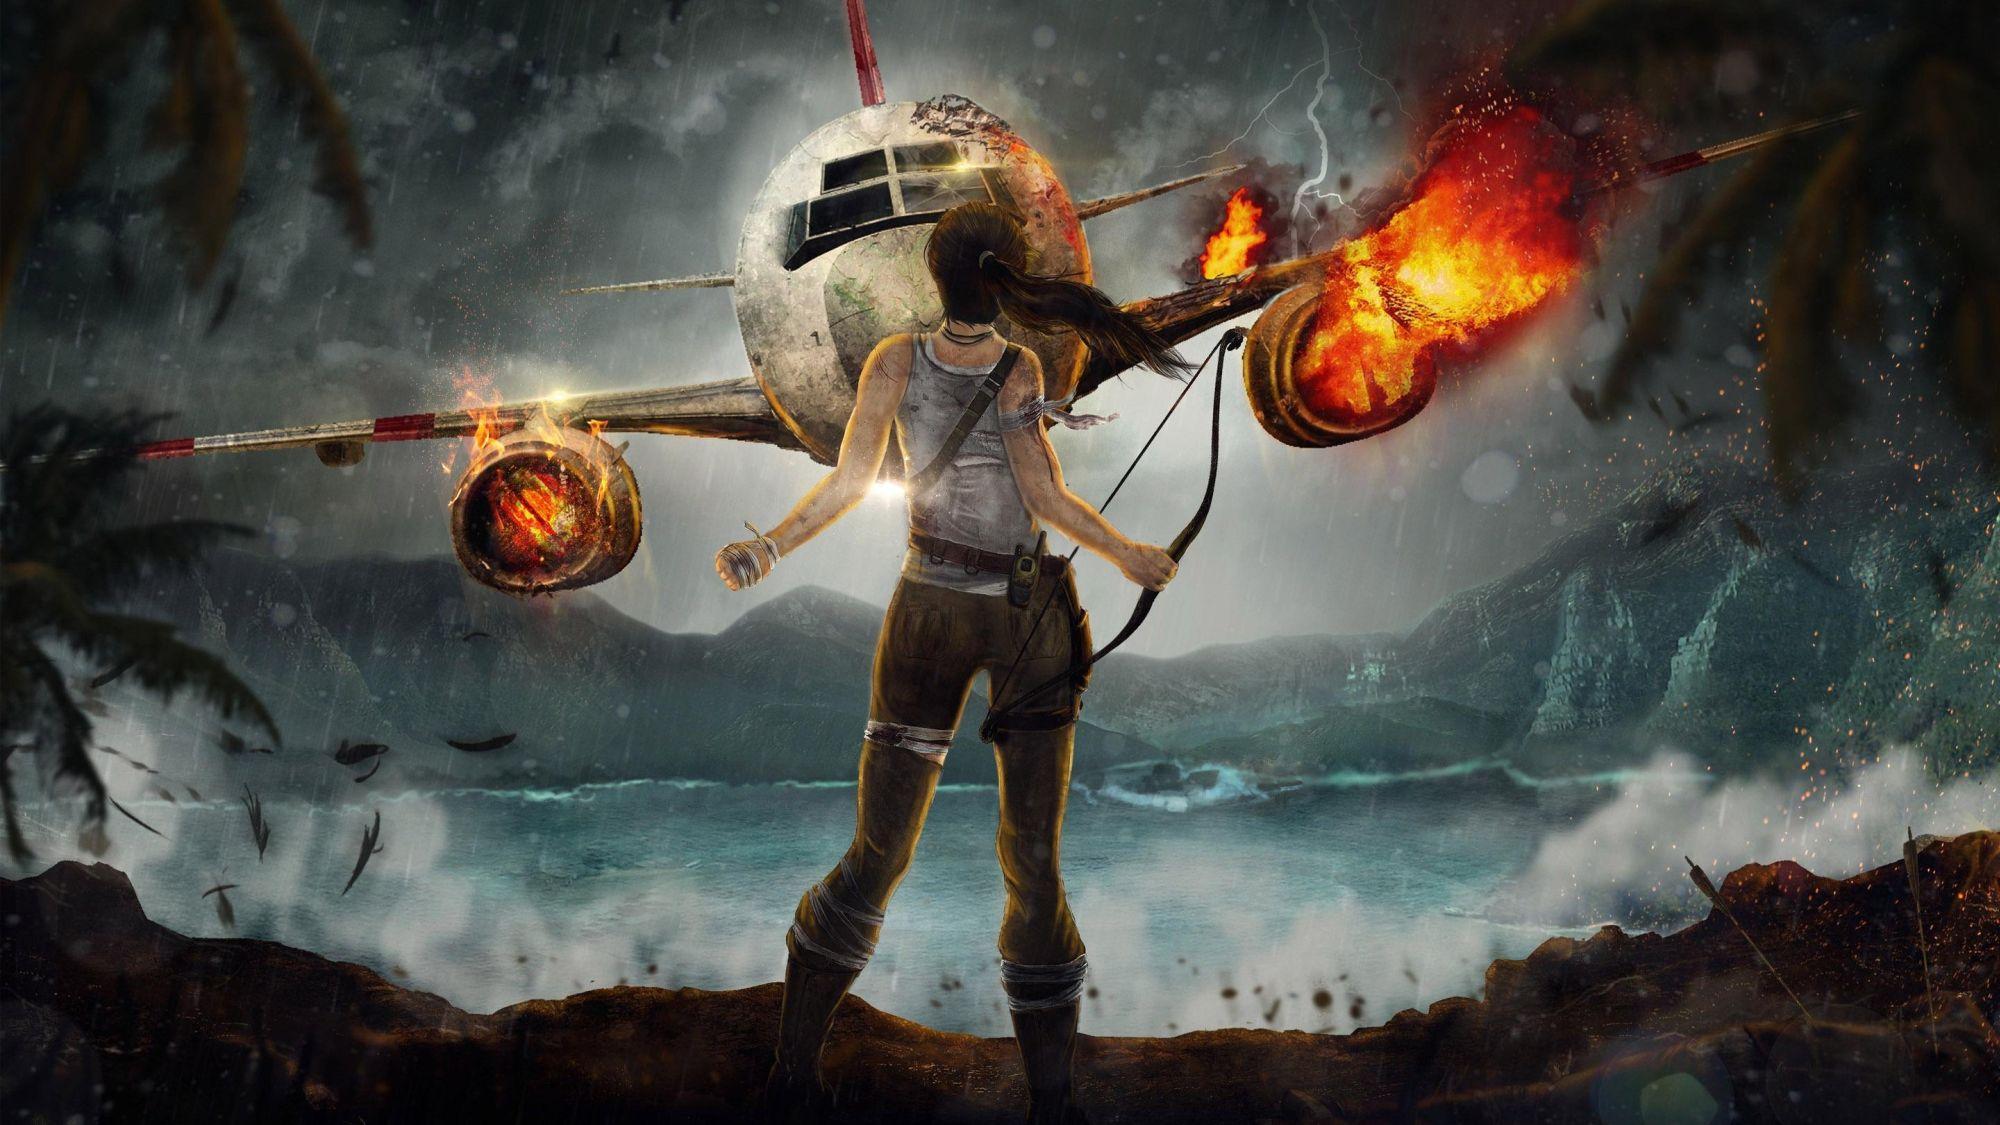 2880x1620_lara-croft-looking-at-the-burning-plane-tomb-raider